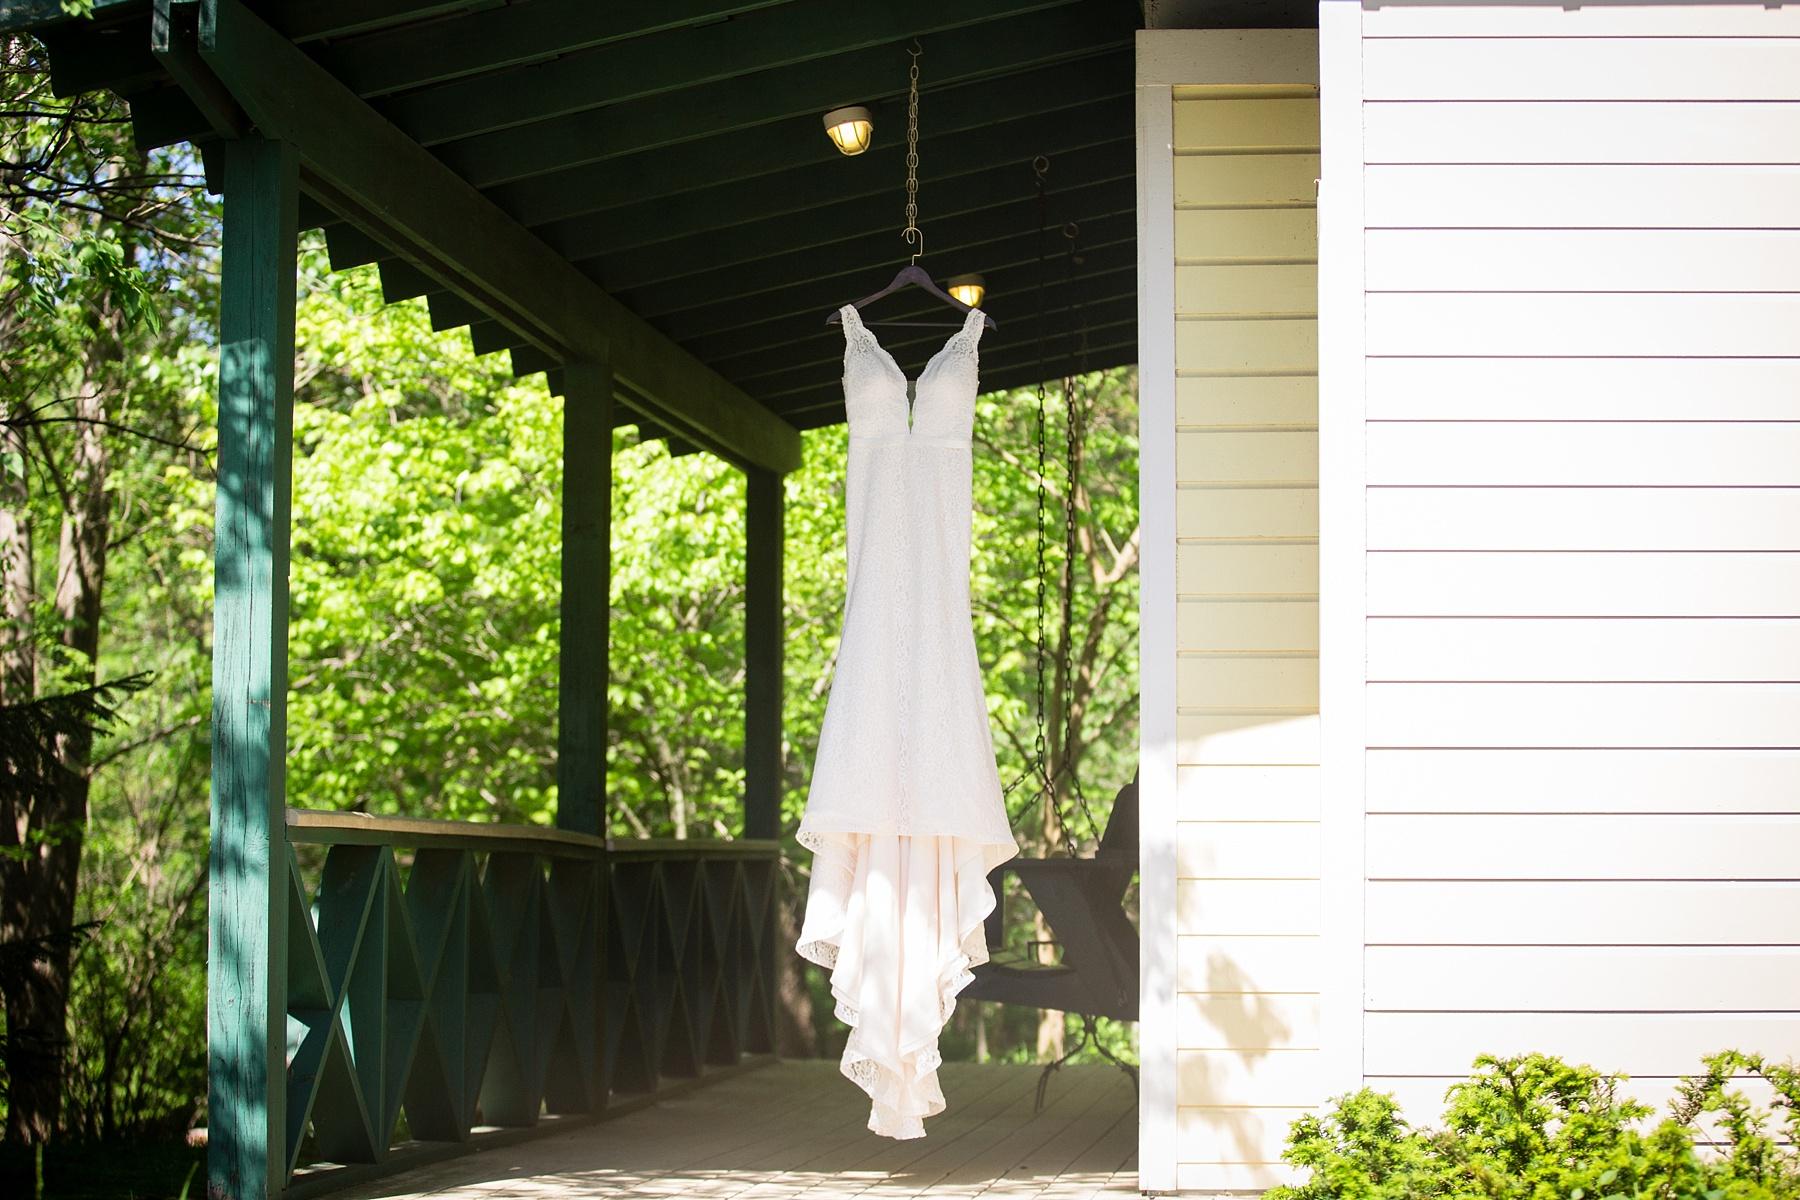 Brandon_Shafer_Photography_Kara_Doug_12_corners_Wedding_Benton_Harbor_0001.jpg